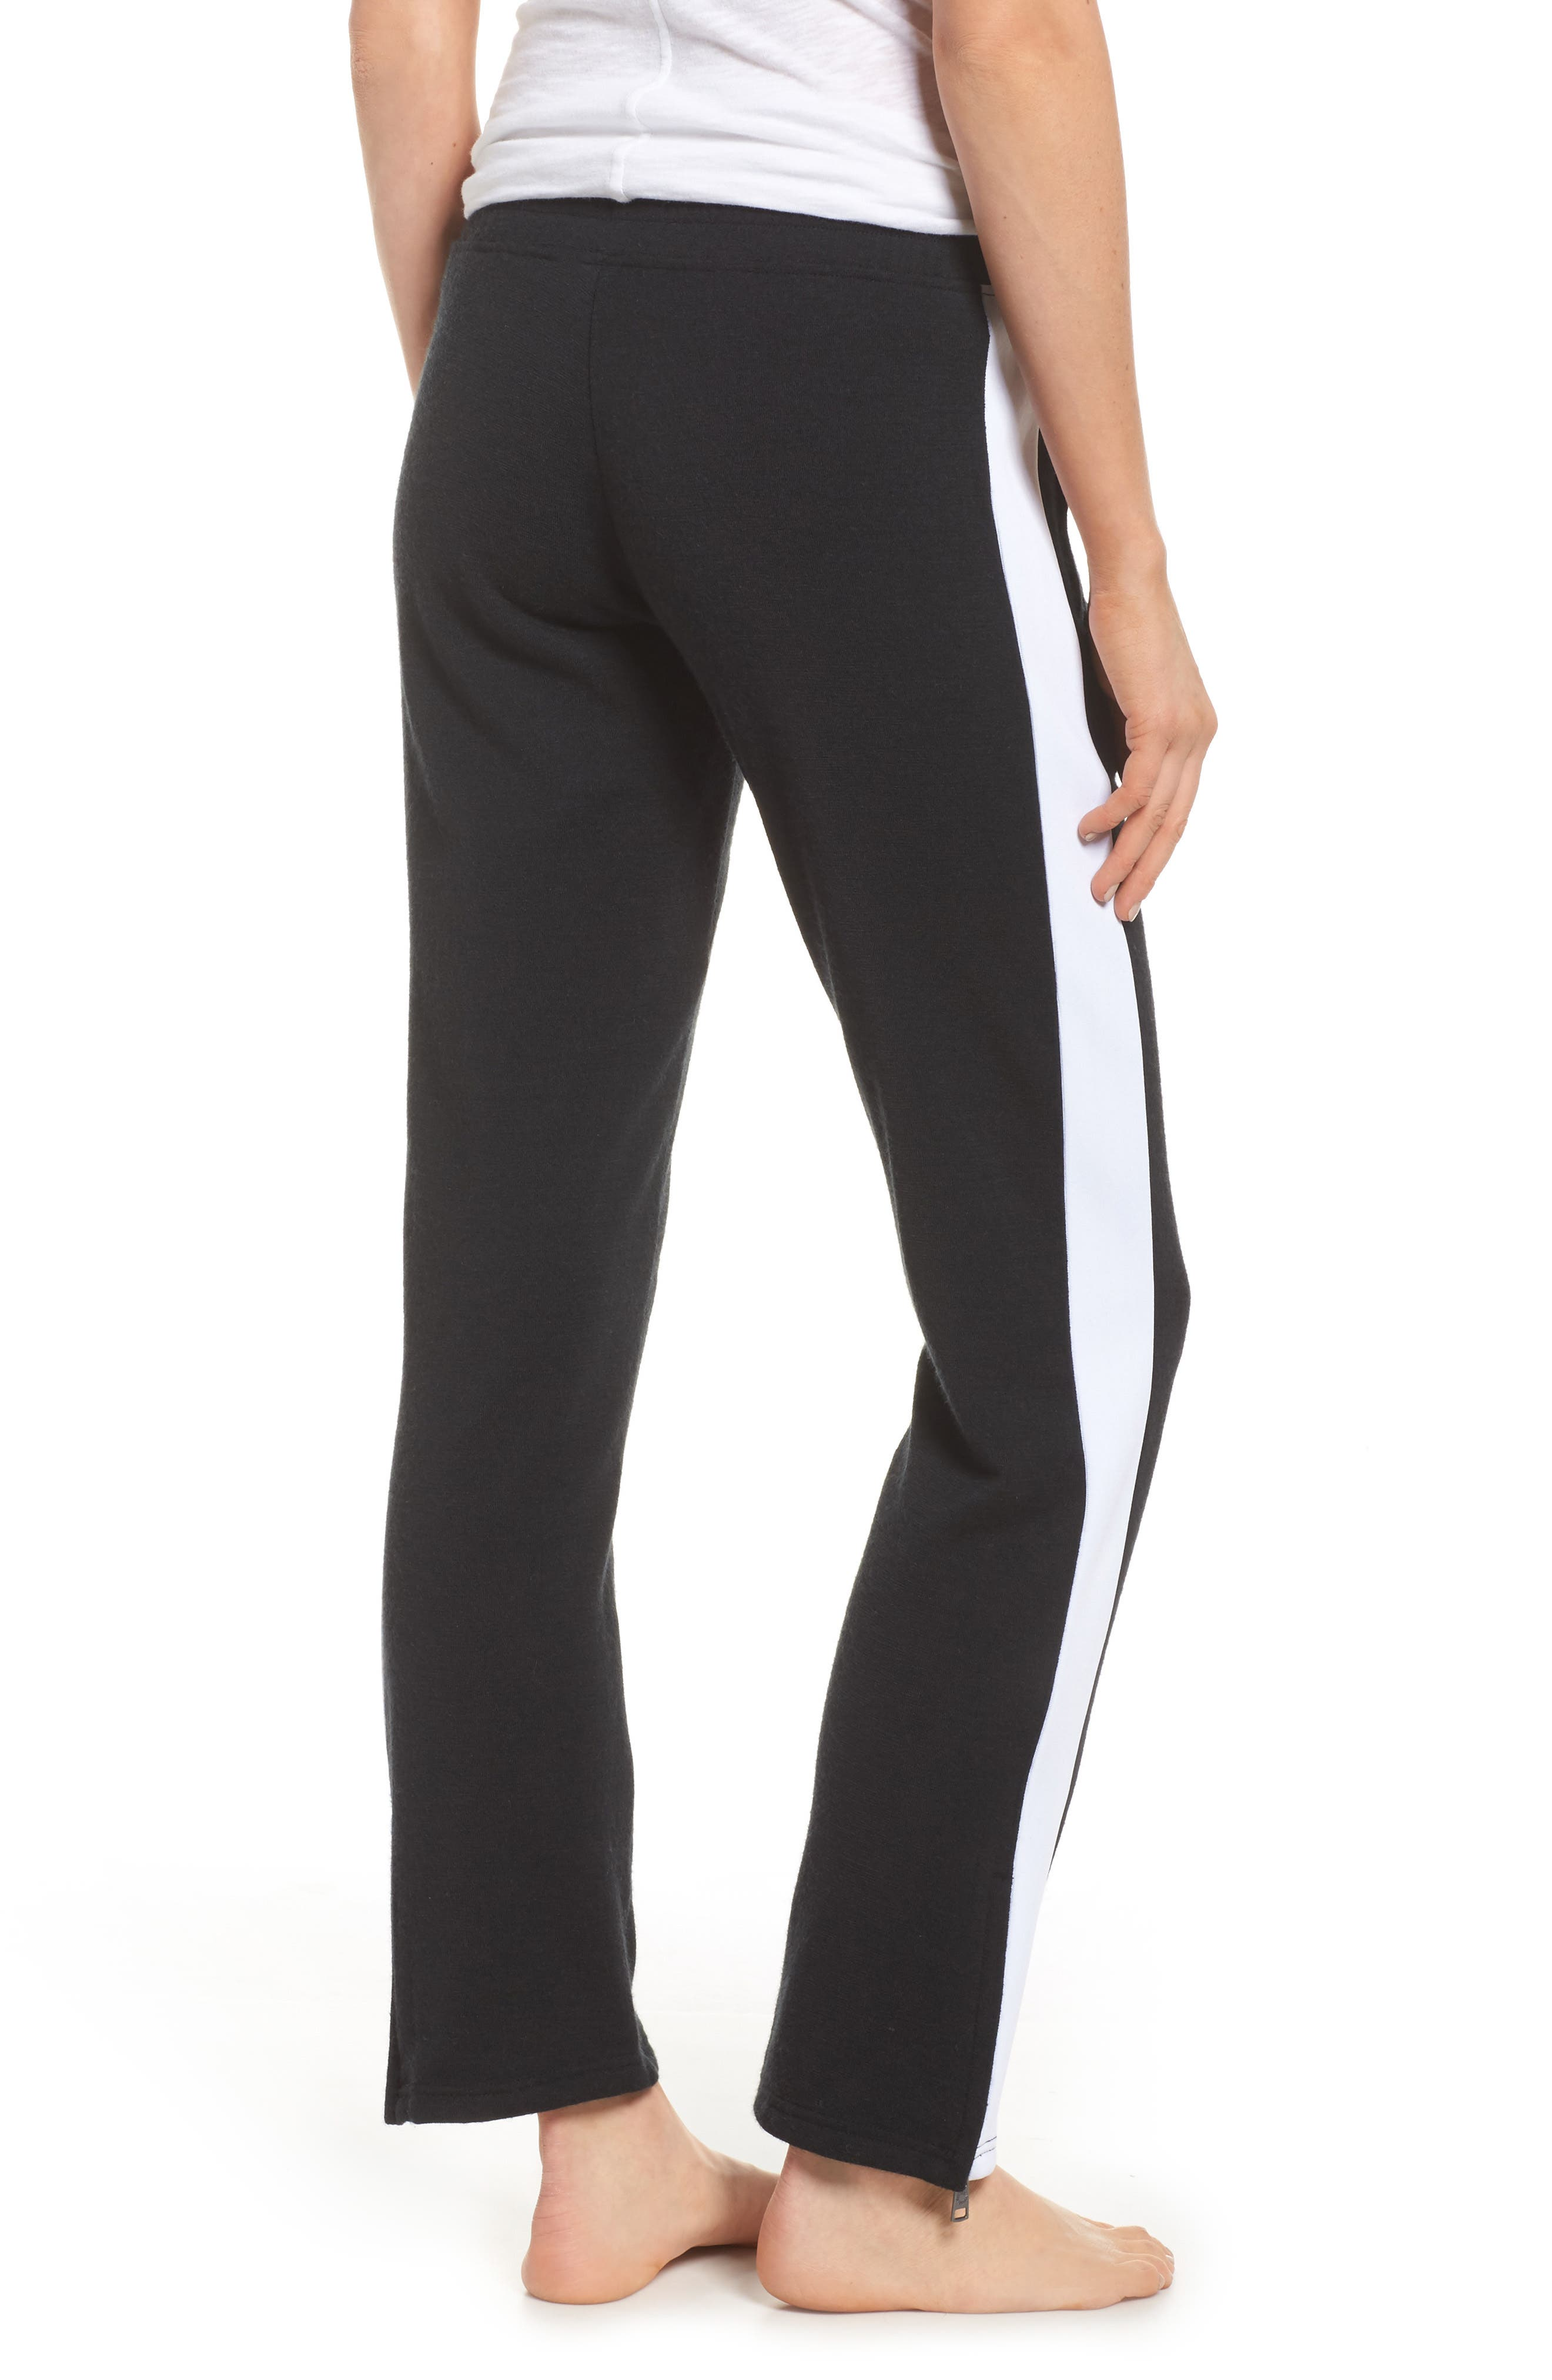 Lizy Track Pants,                             Alternate thumbnail 2, color,                             Black